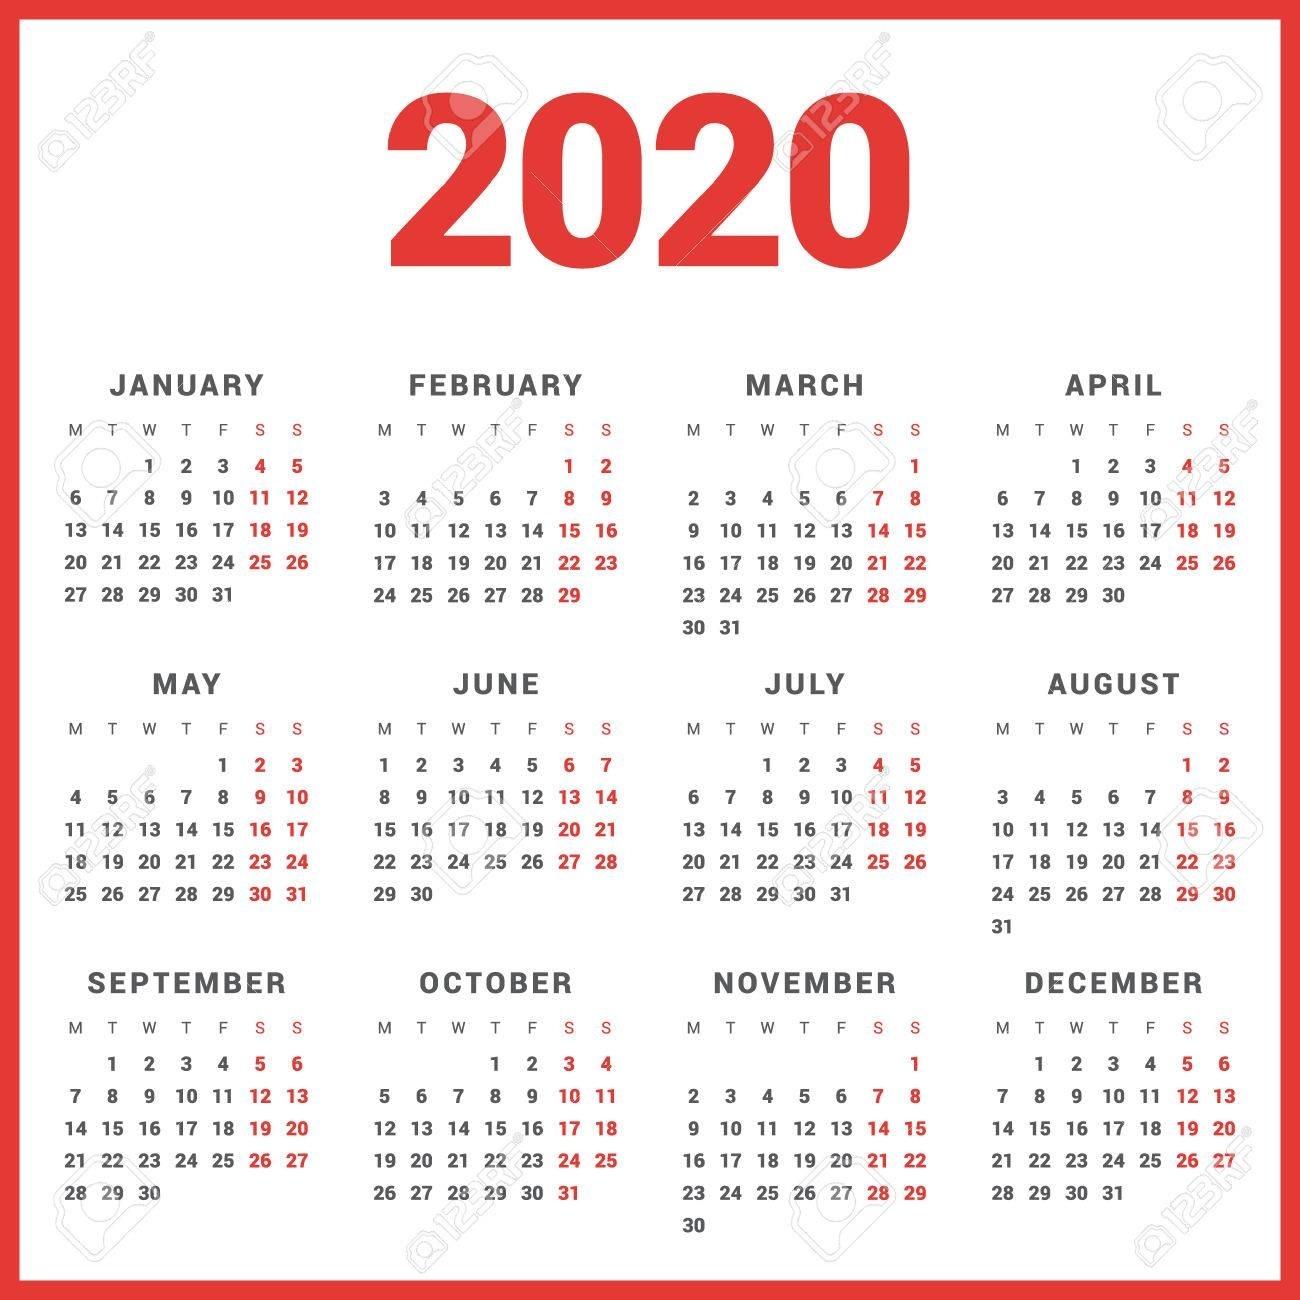 Calendar For 2020 Year On White Background. Week Starts Monday Perky 2020 Calendar Starting Monday